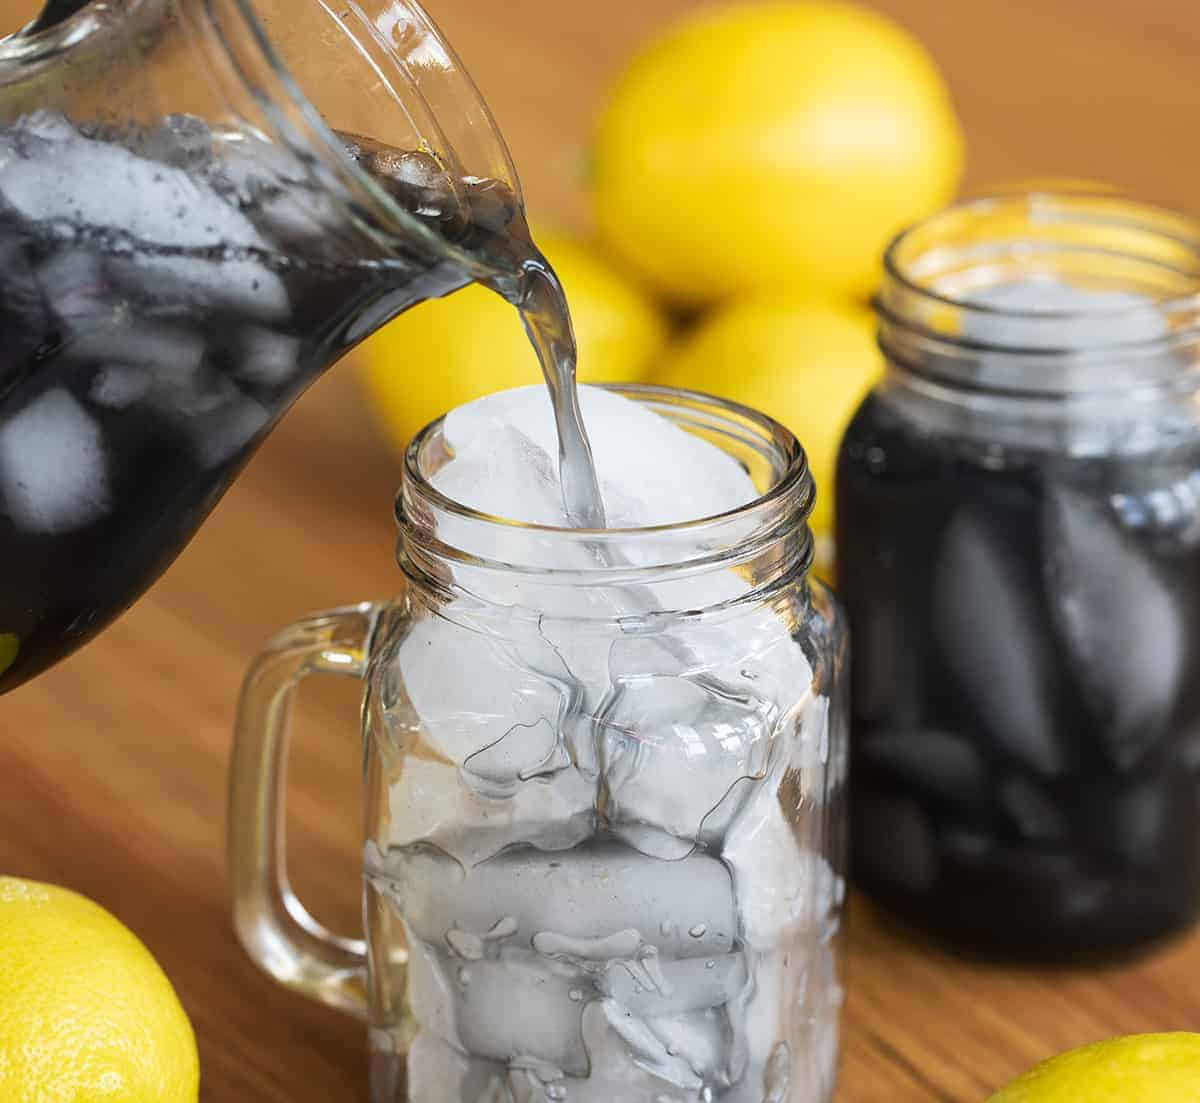 Pouring Charcoal Lemonade into Glass